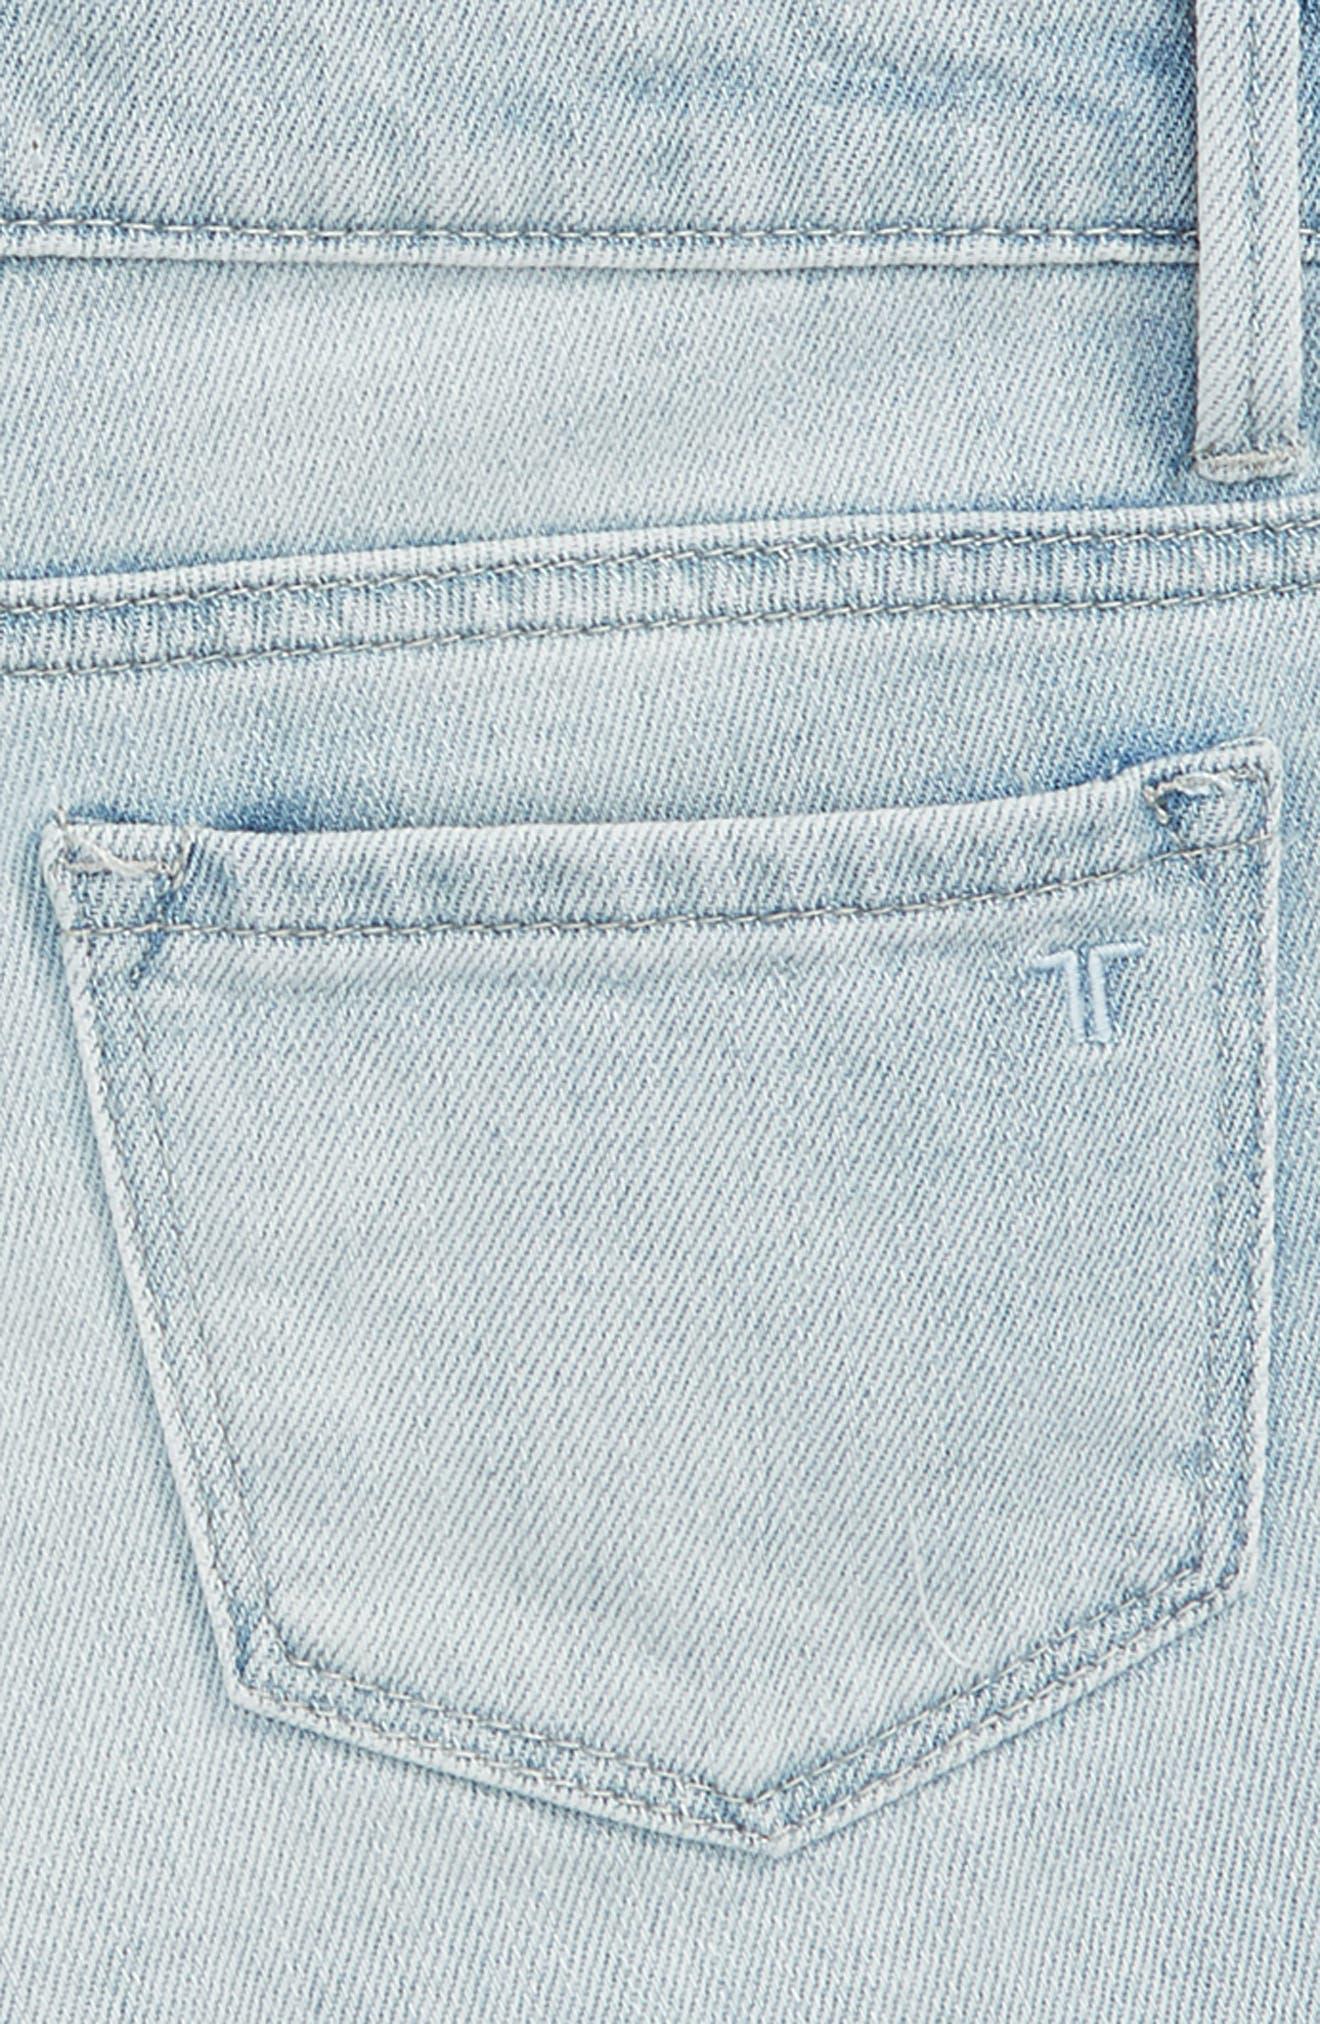 Lace Denim Shorts,                             Alternate thumbnail 3, color,                             Light Indigo